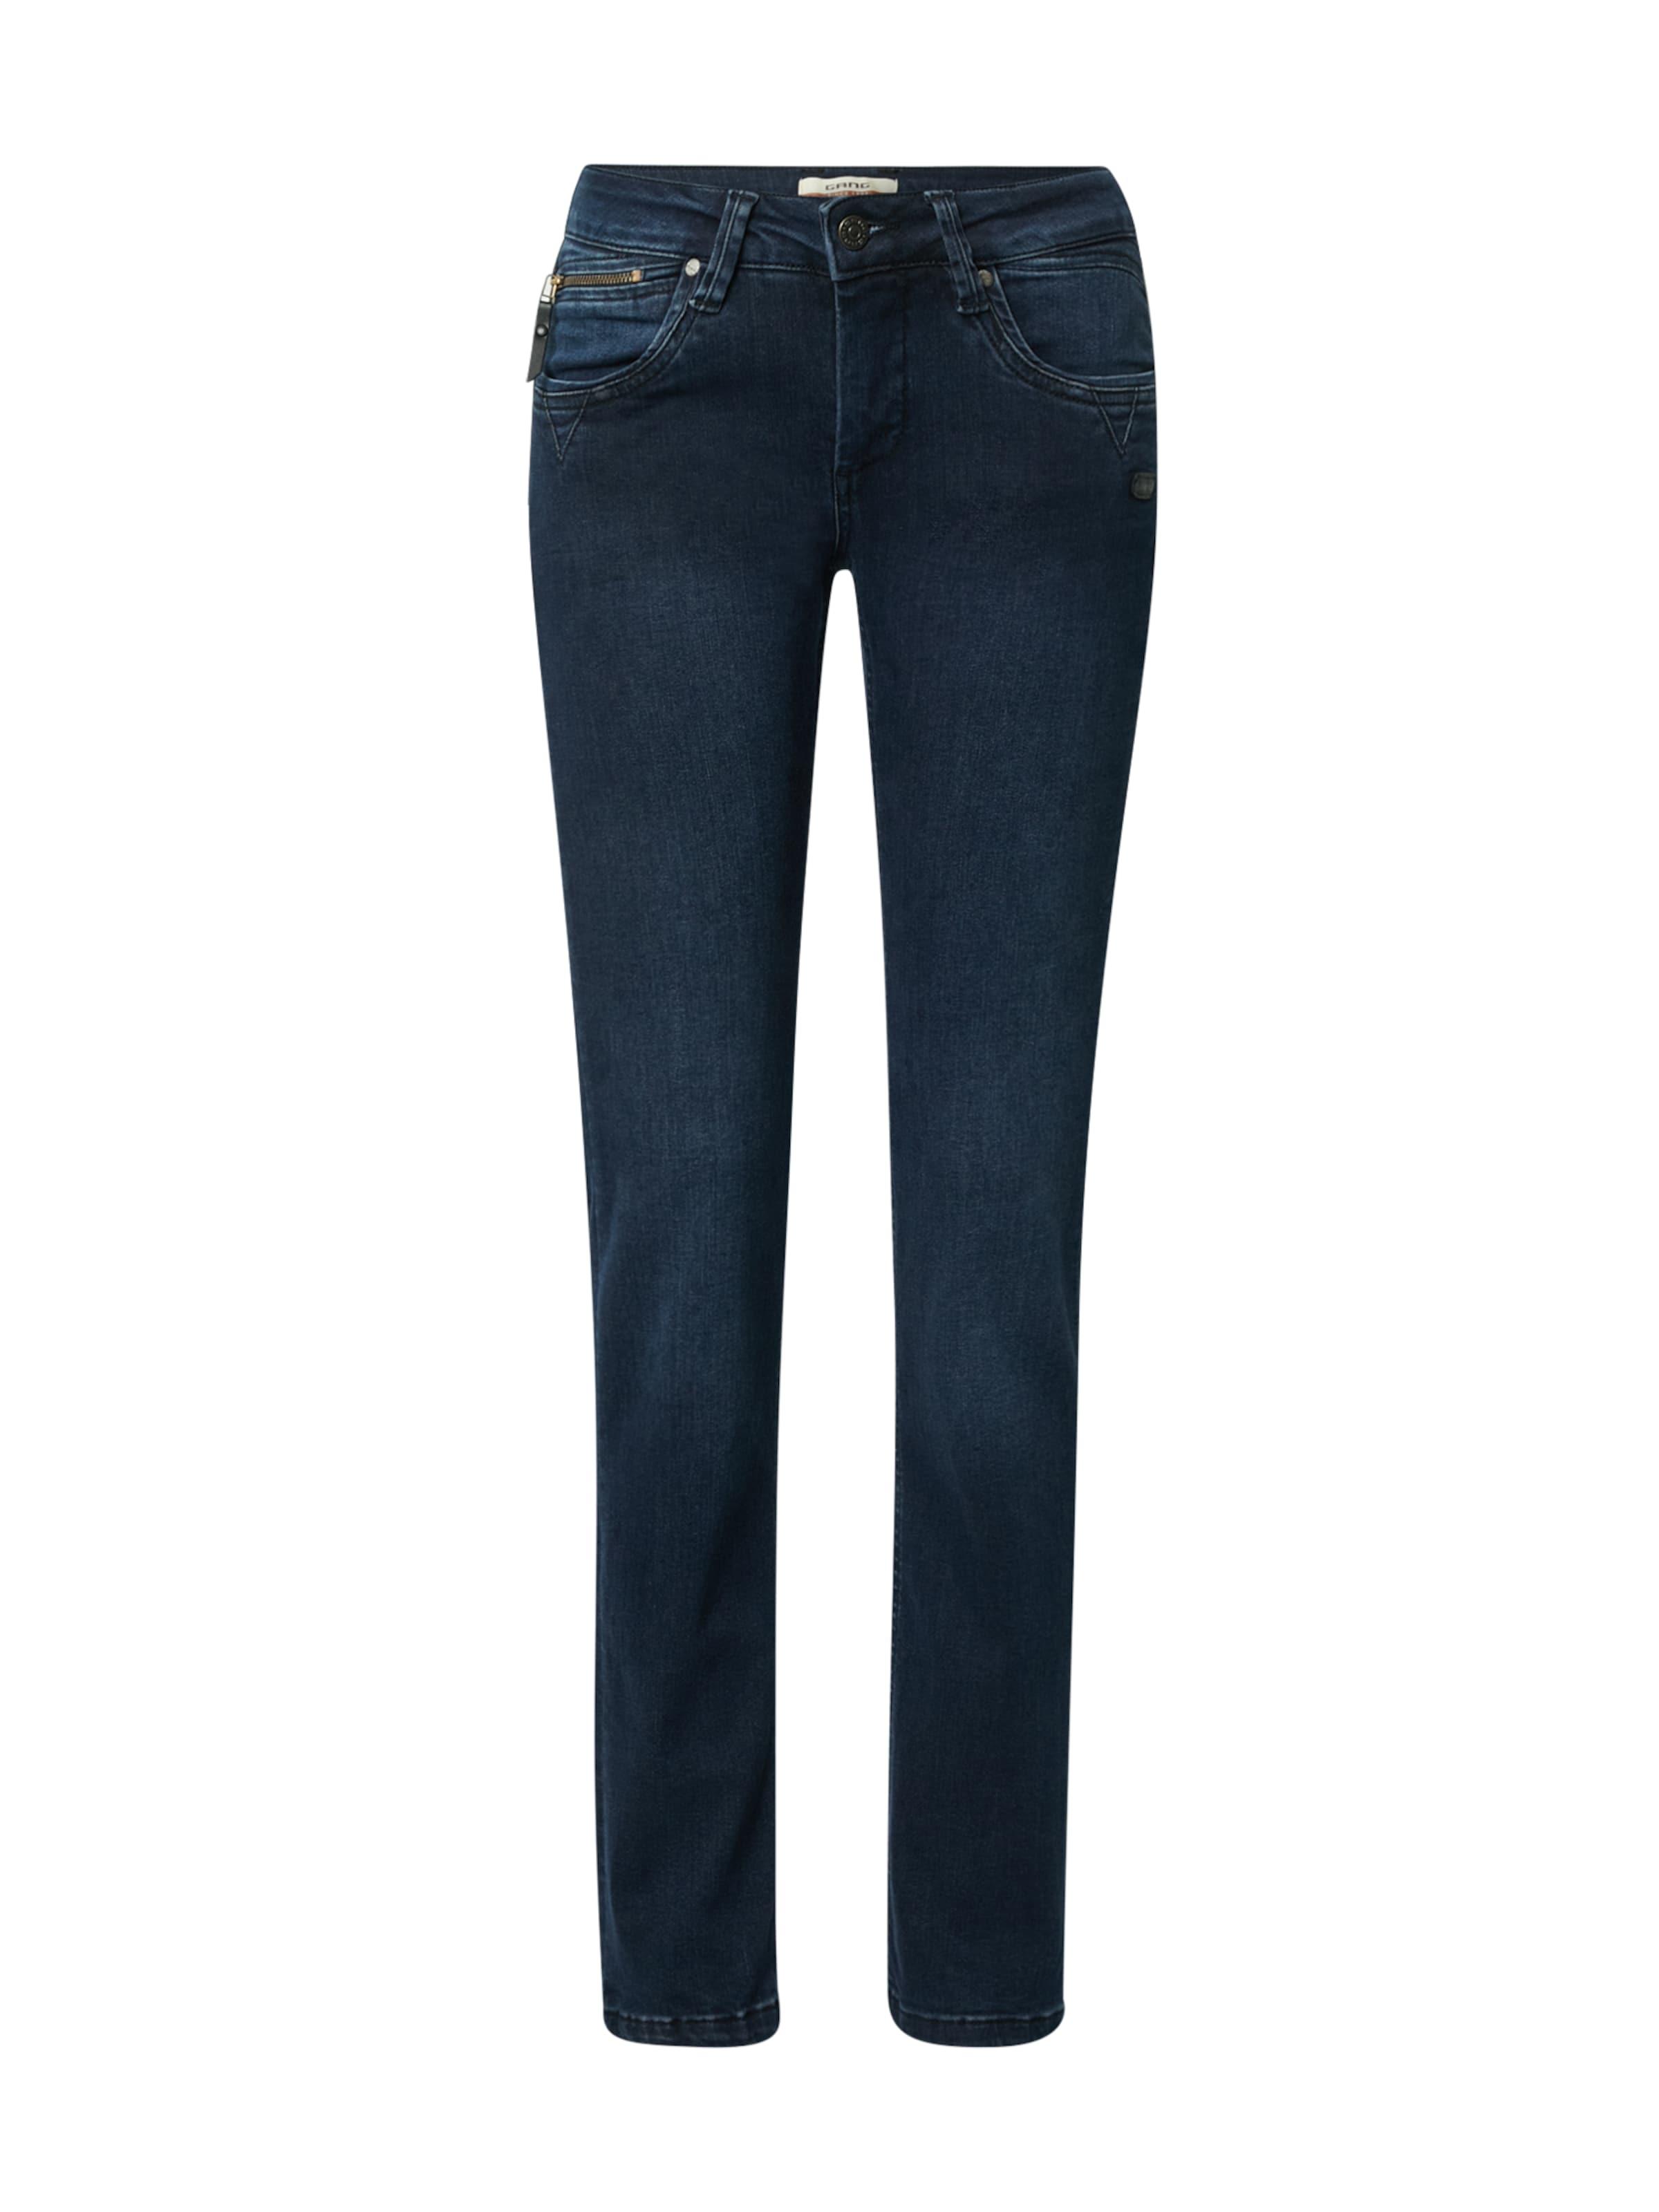 Gang Jeans 'Nikita' in dunkelblau